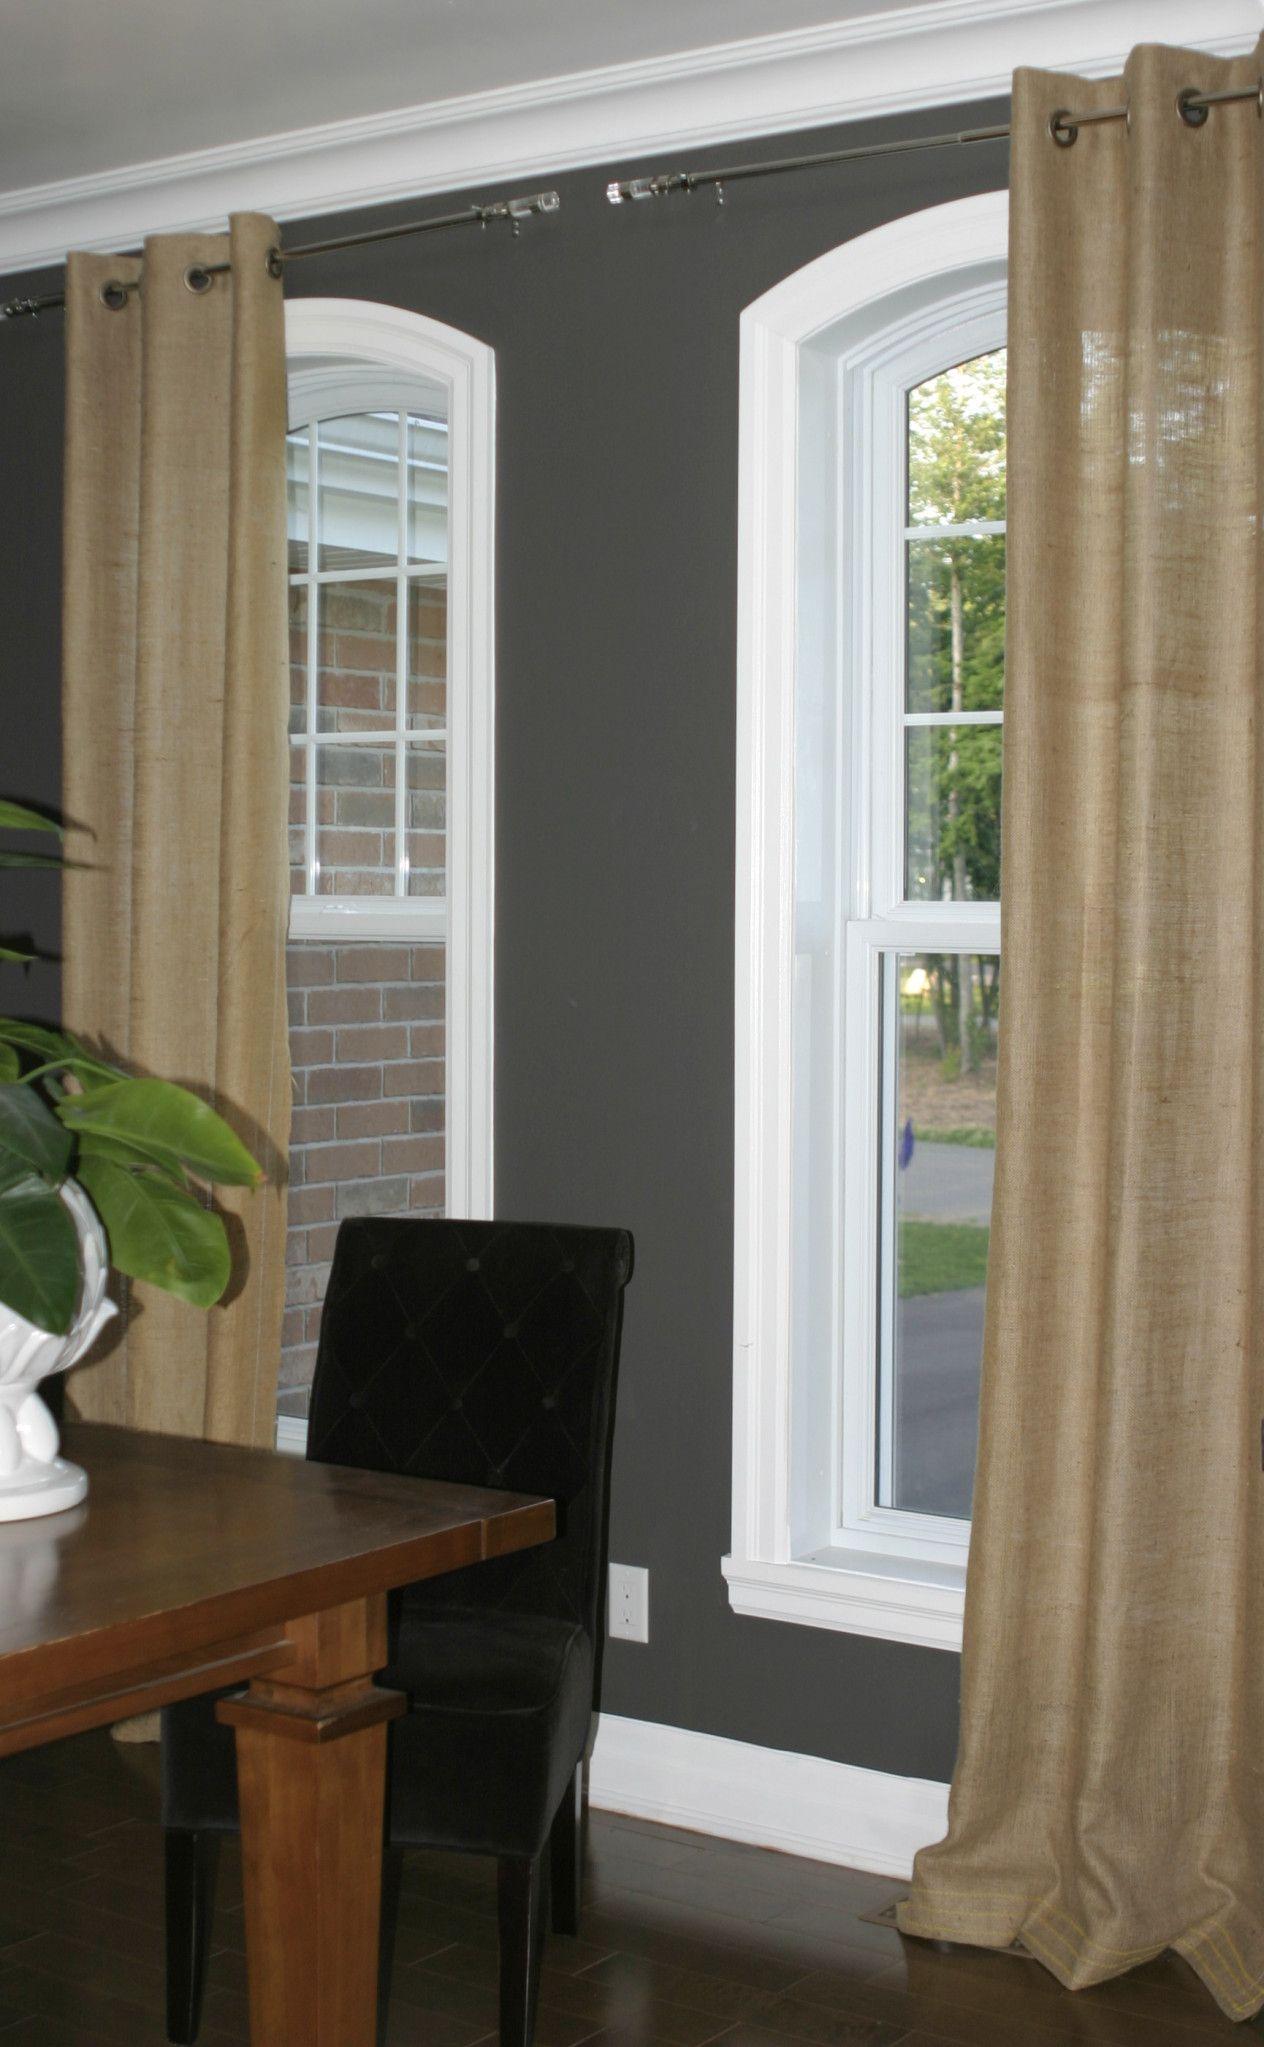 No curtain window ideas  burlap curtains dining room  new place  pinterest  hessian room